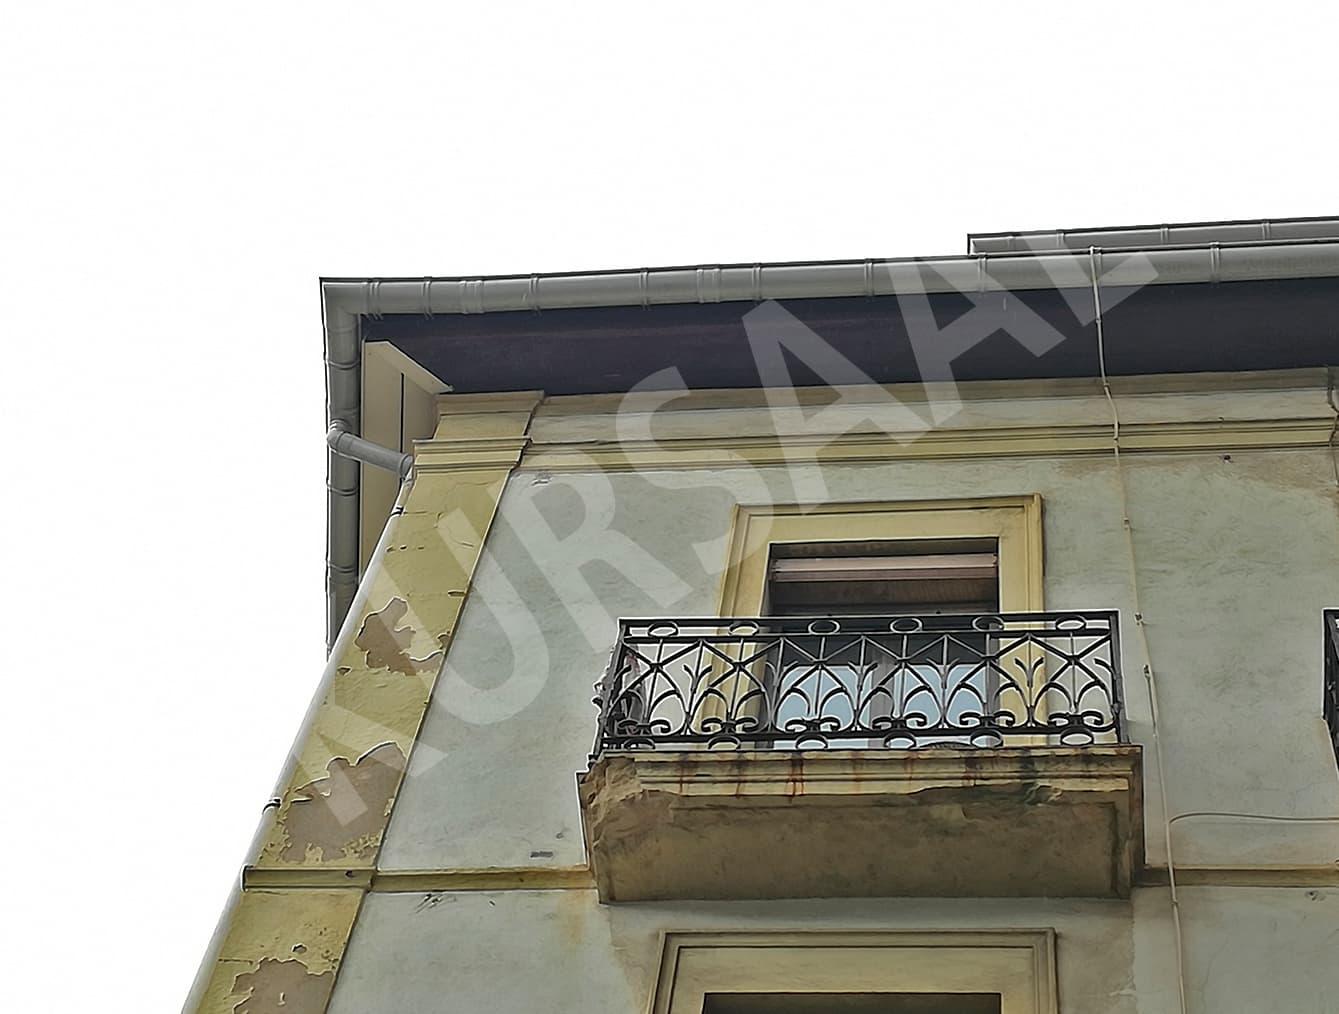 foto 3 - Restauración y patrimonio-Huertas, 4-DONOSTIA, GIPUZKOA